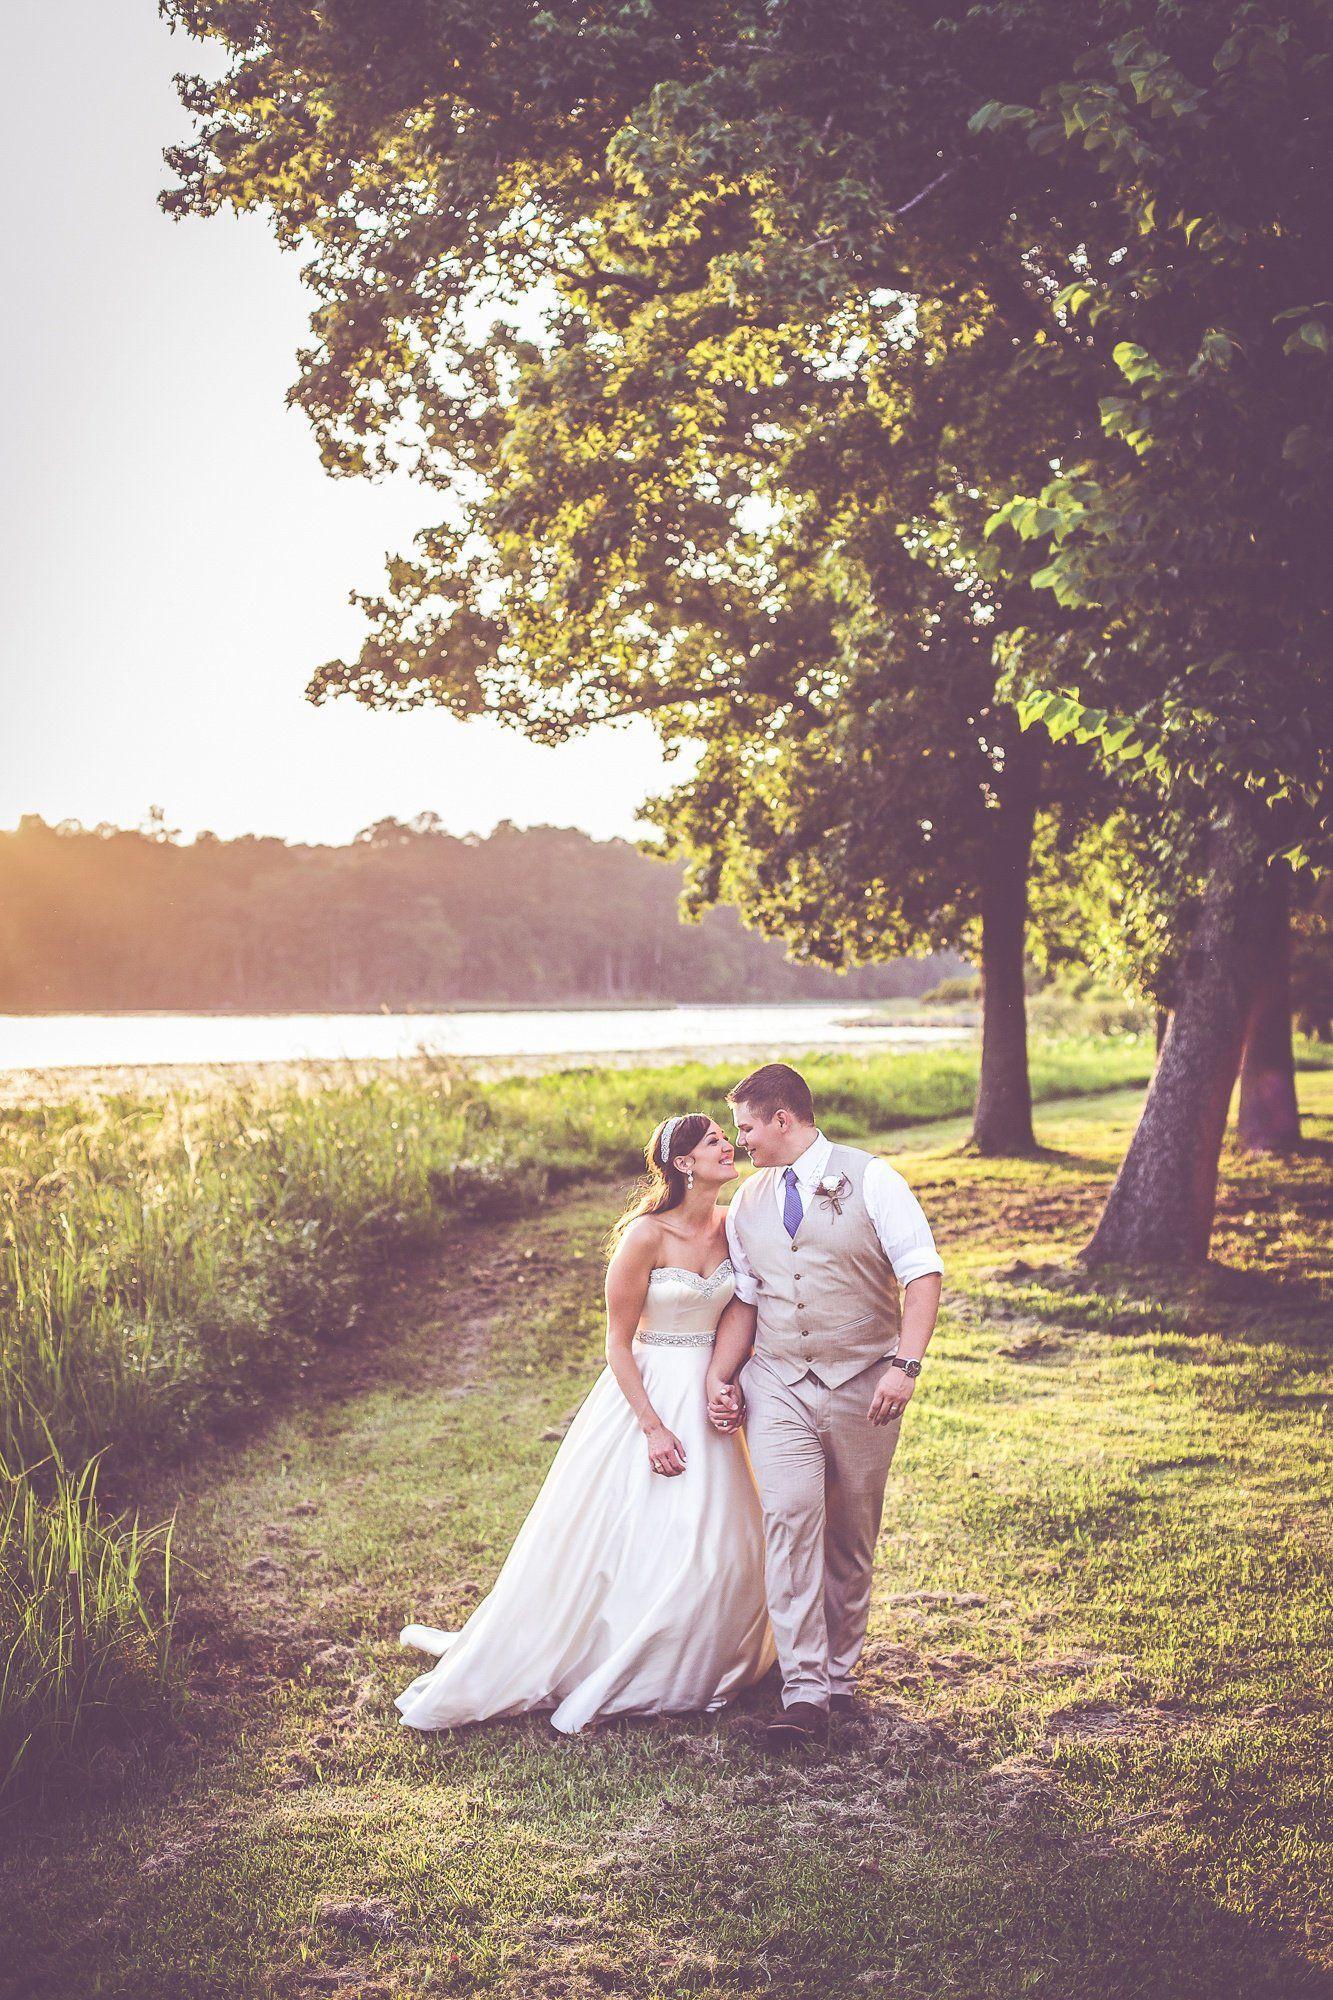 A Rustic Diy Wedding At Raven Lodge In Huntsville Texas Rustic Wedding Diy Park Weddings Diy Outdoor Weddings